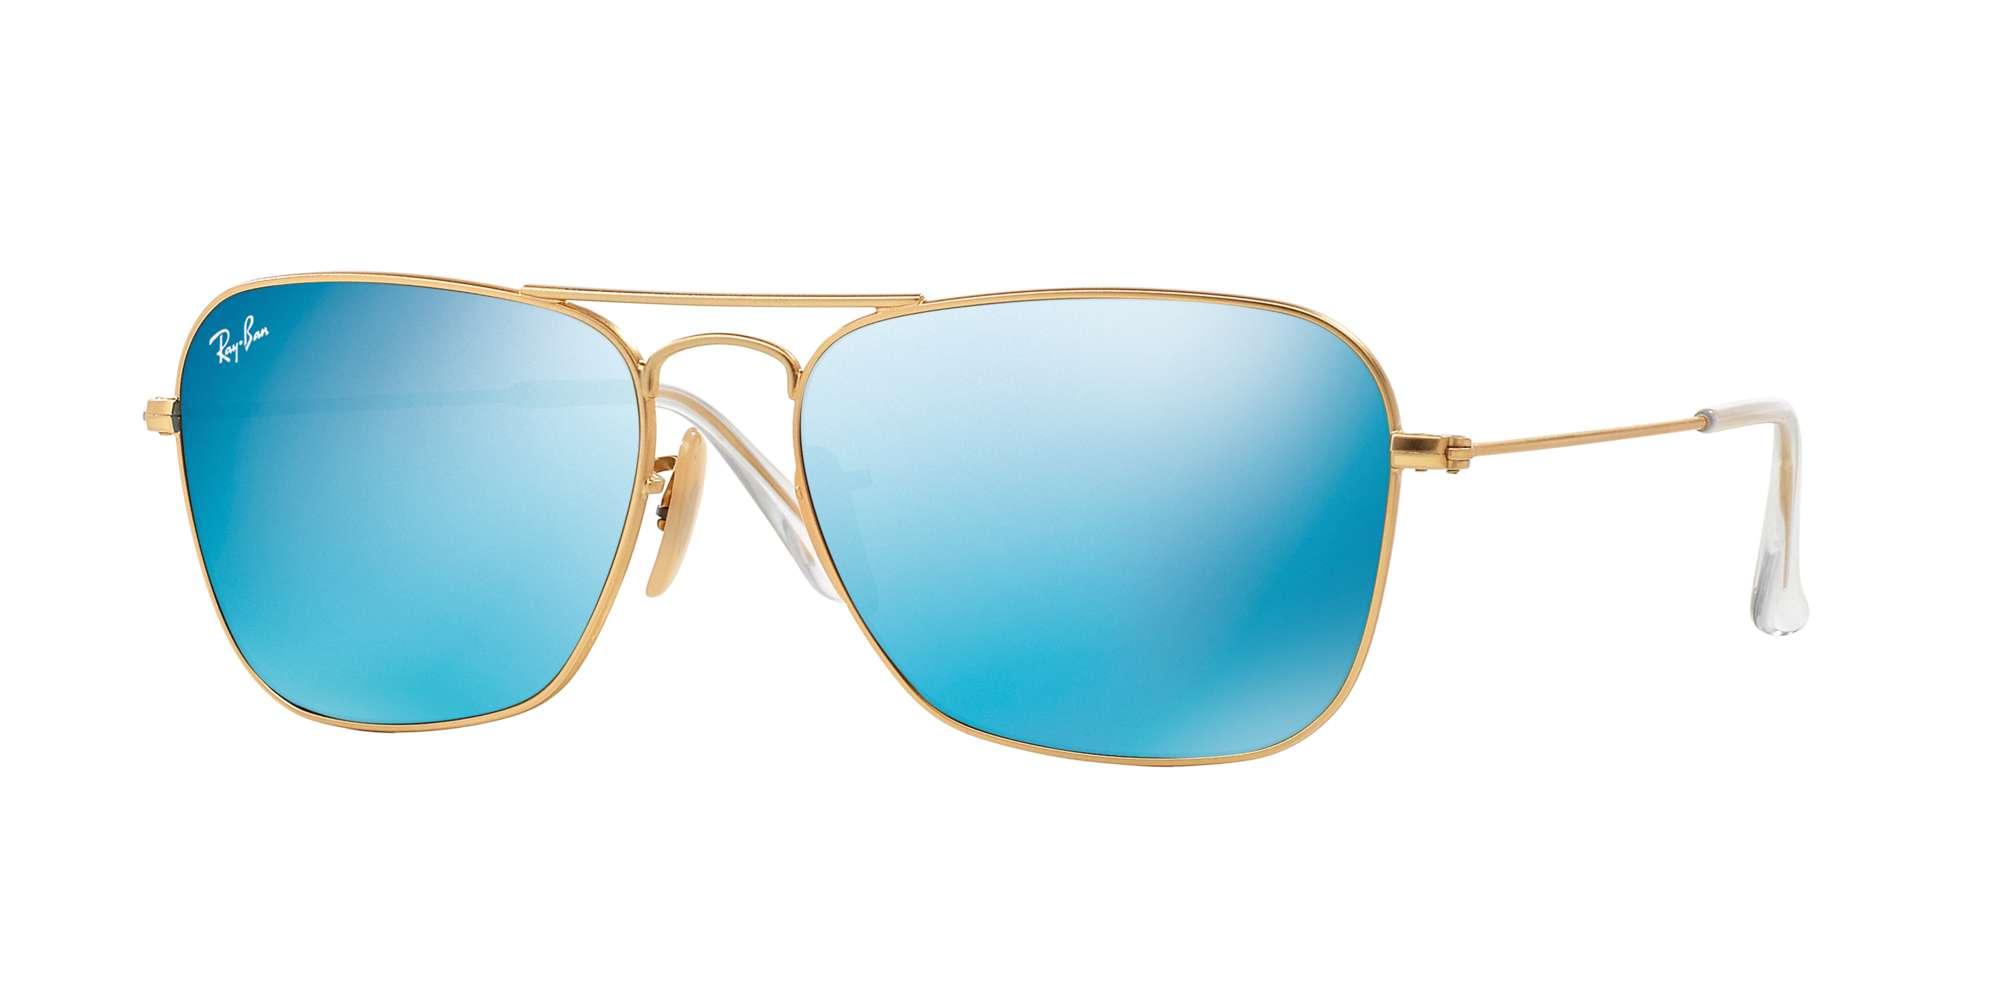 MATTE GOLD / GREY MIRROR BLUE lenses